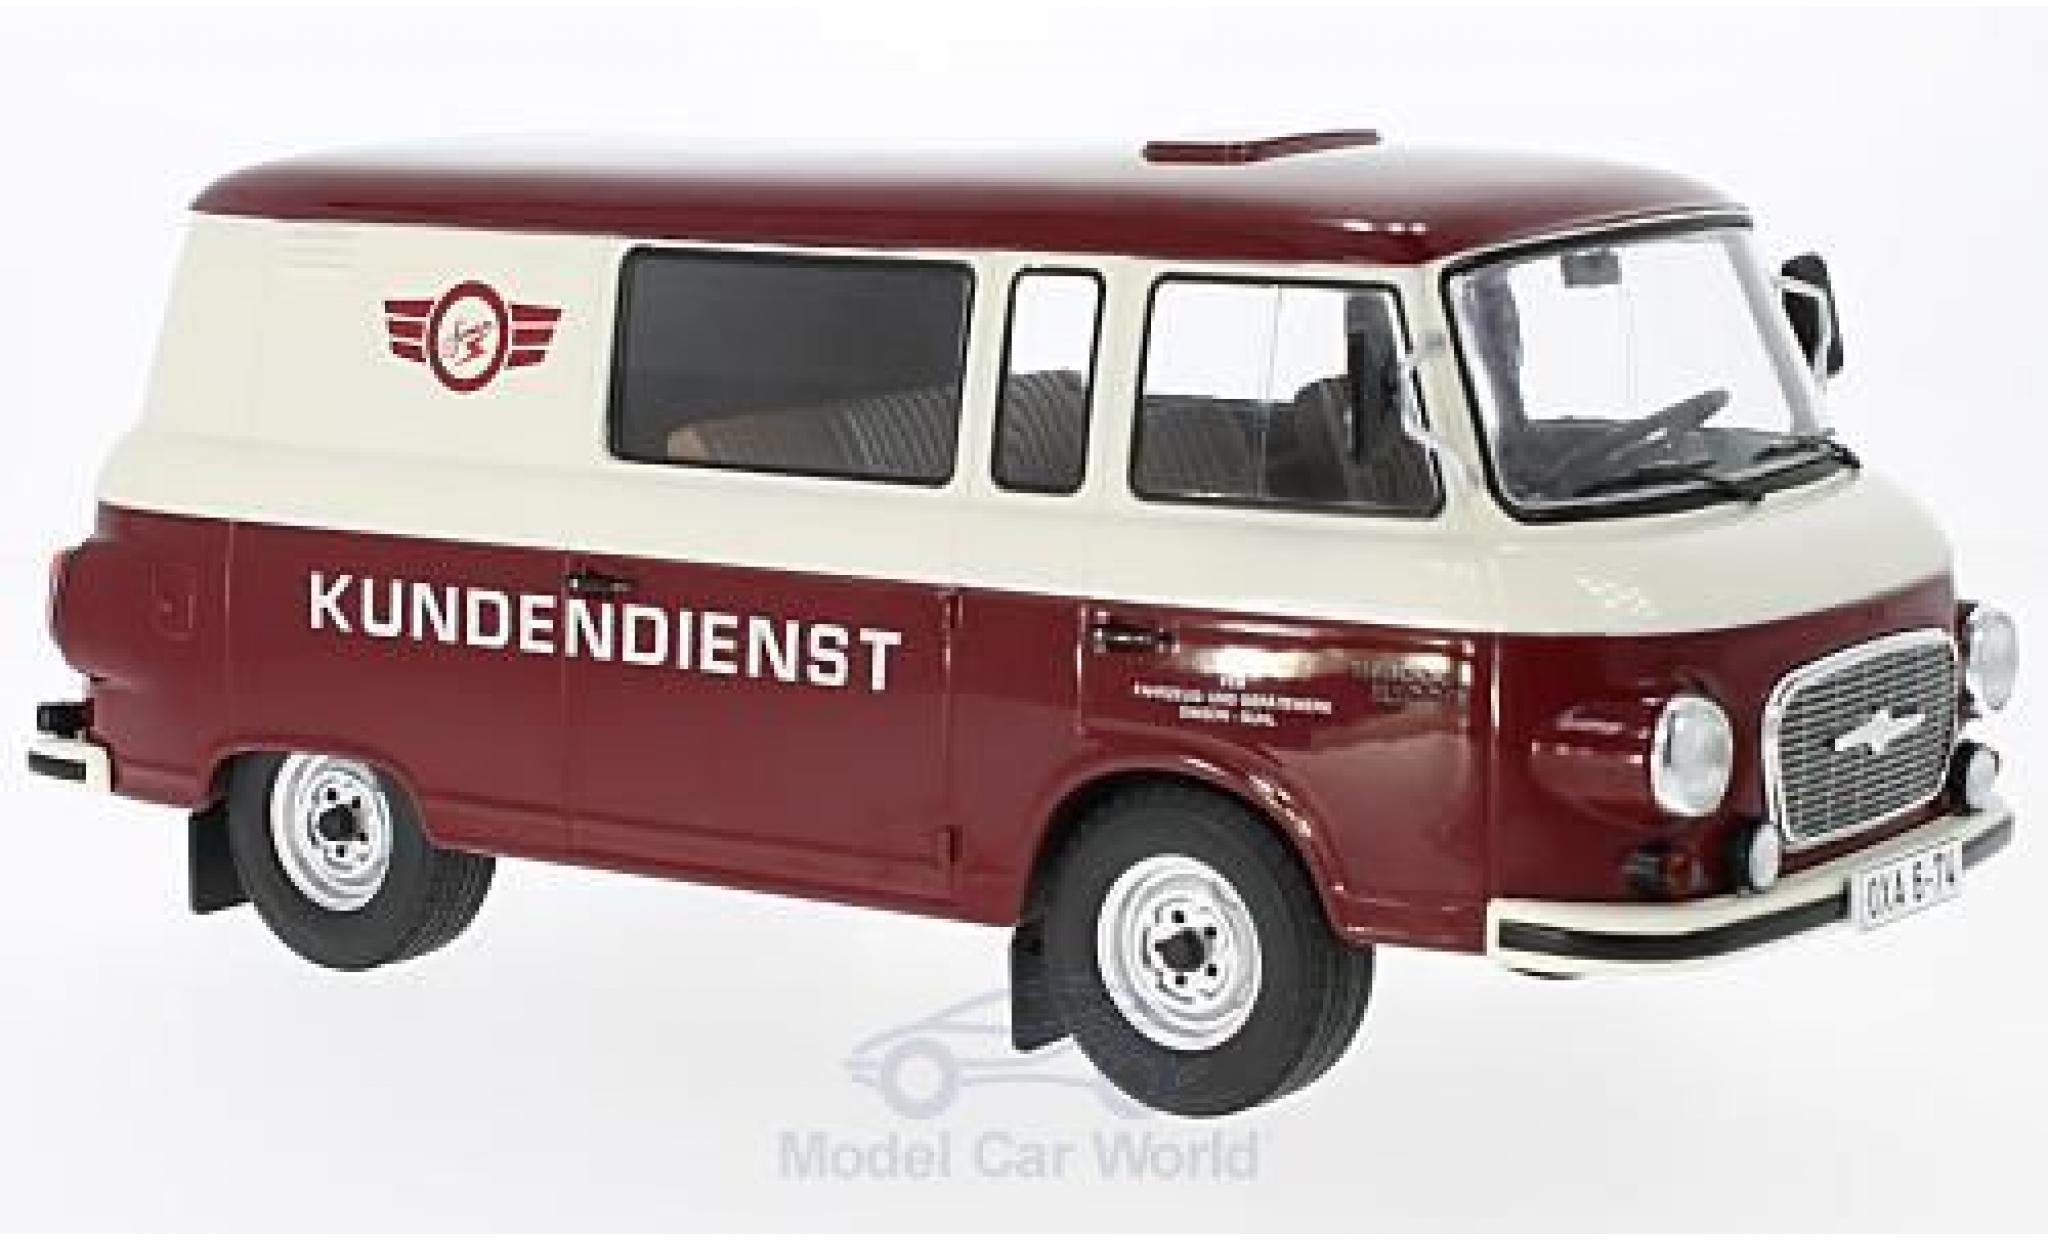 Barkas B 1000 1/18 MCG Halbbus Simson Kundendienst 1970